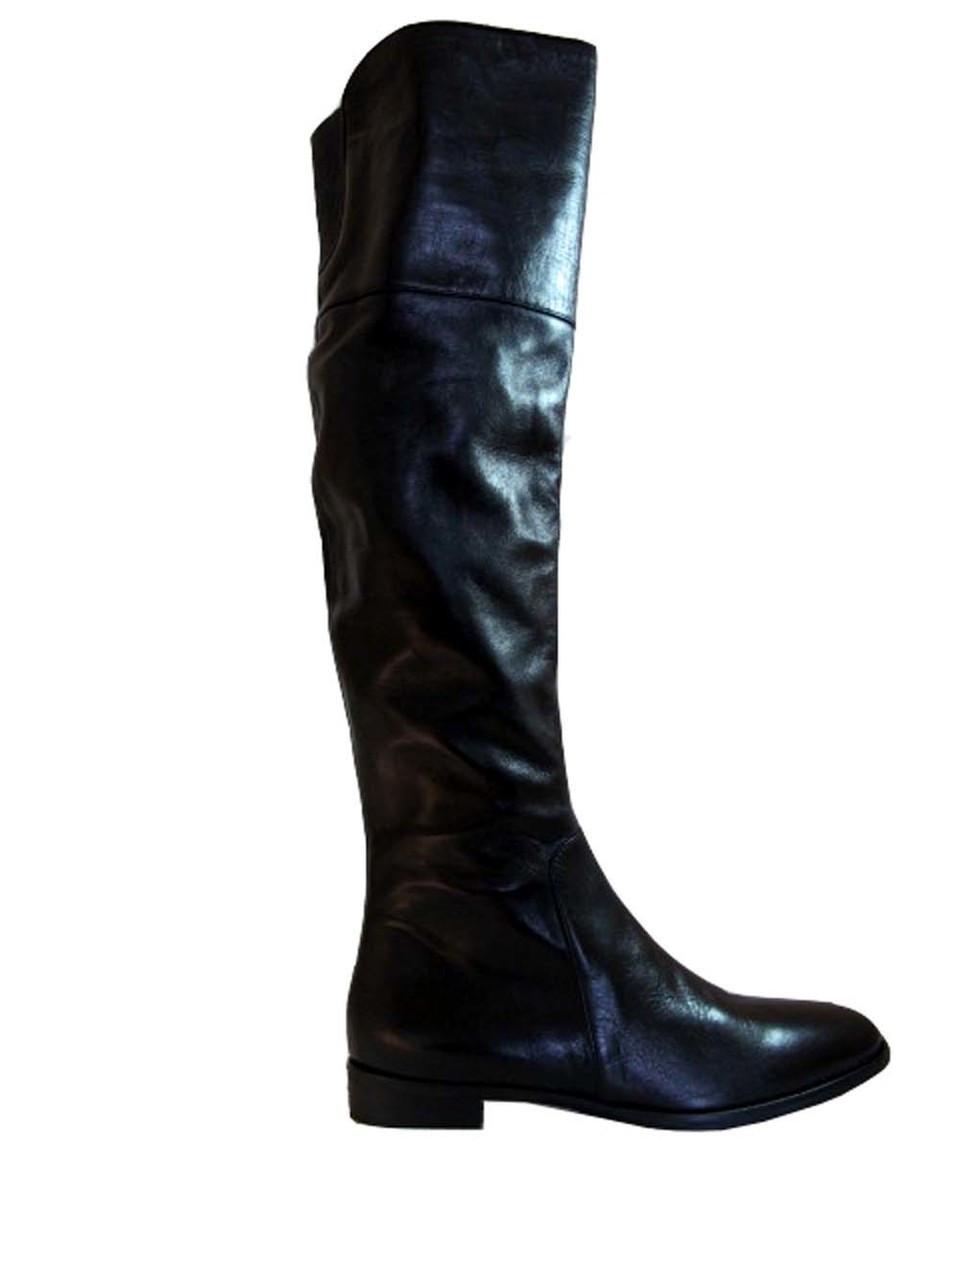 Julie Dee 6627 Women's Knee high Italian Leather Flat Boots Black